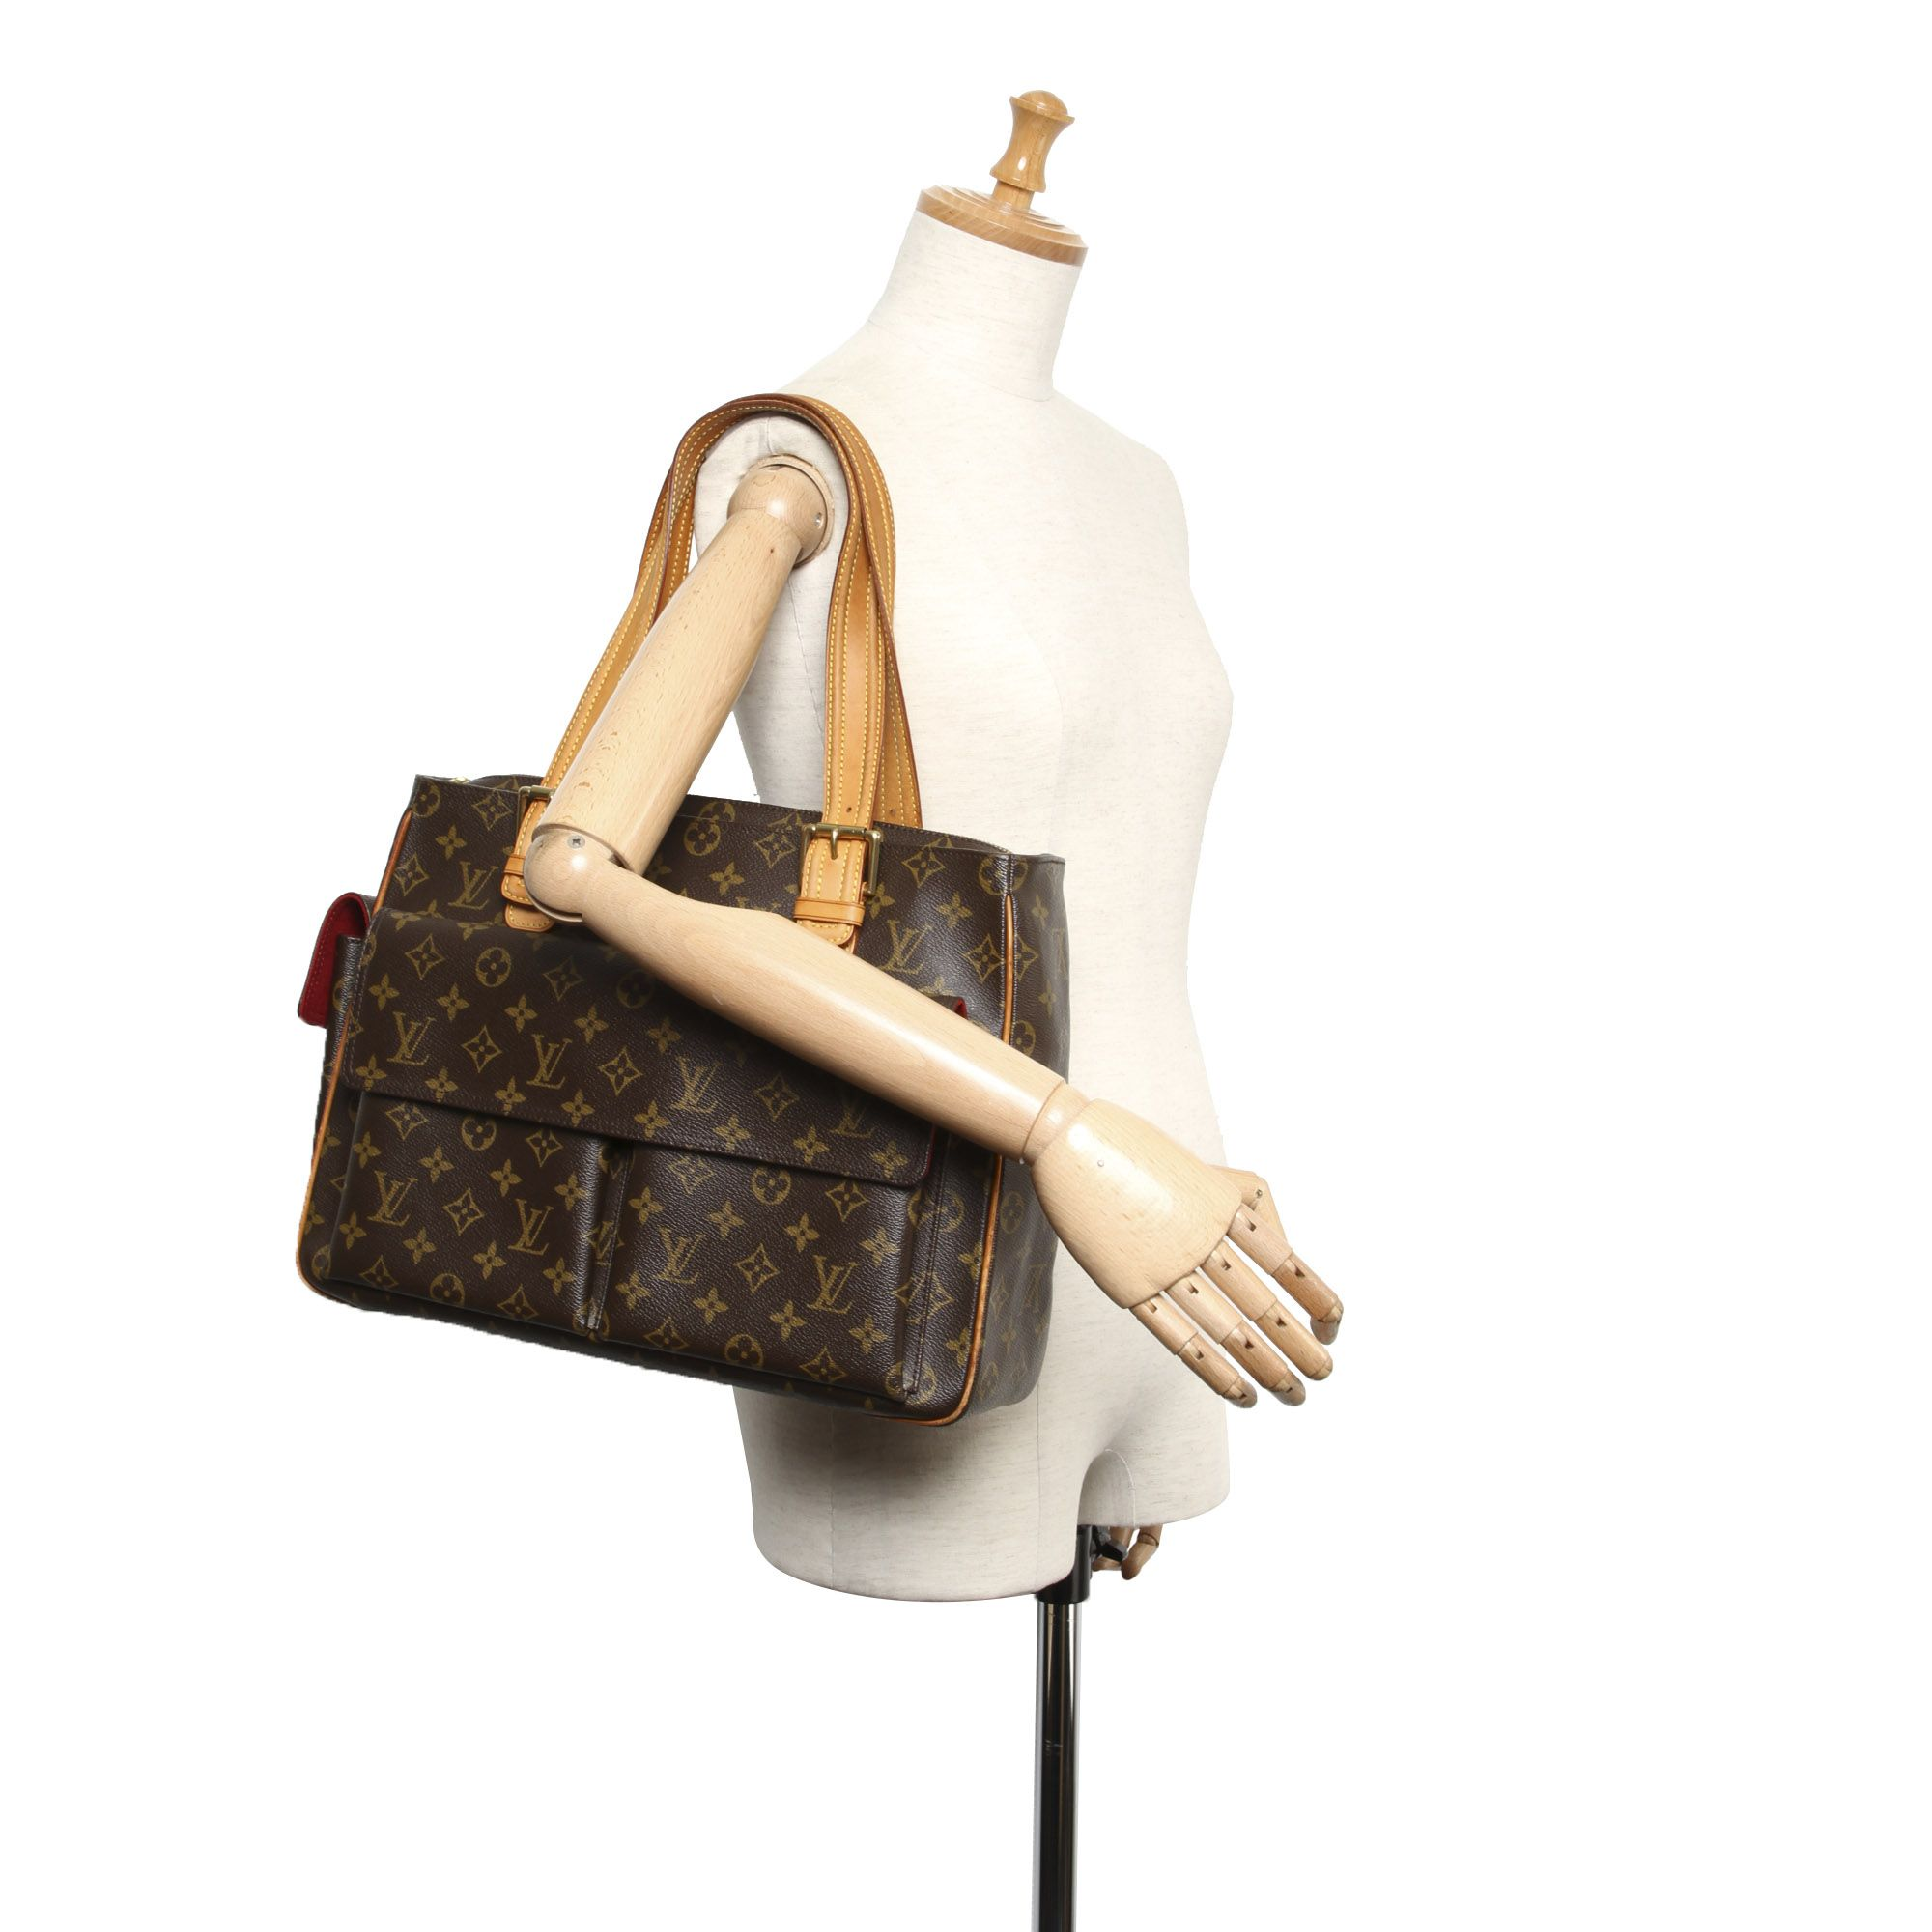 Vintage Louis Vuitton Monogram Multipli-Cite Brown